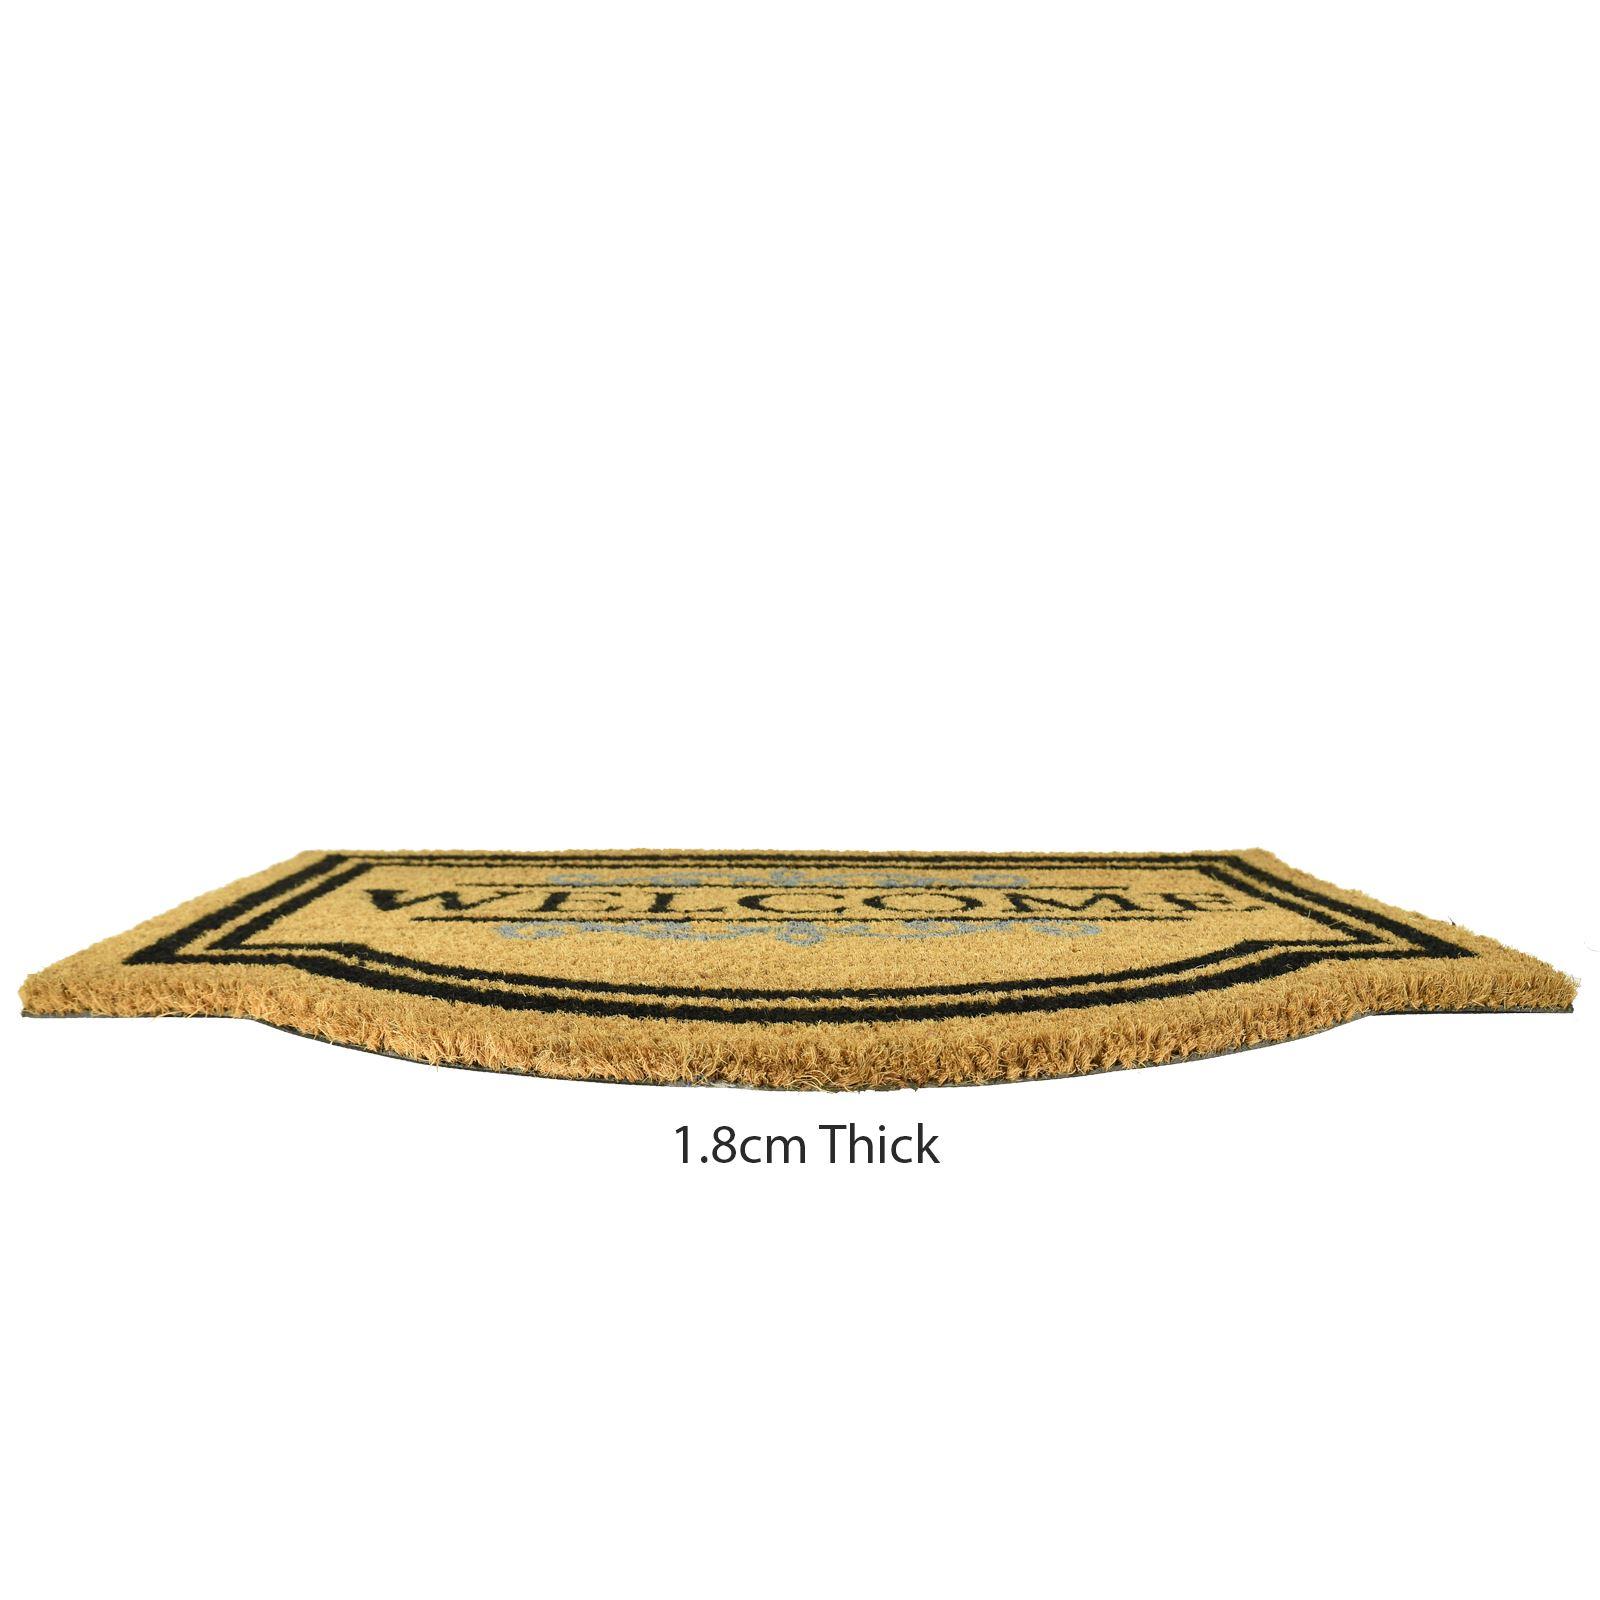 Plain-Non-Slip-Door-Mat-Tough-Natural-Coir-PVC-Back-Welcome-Doormat-40-x-60cm miniatura 119